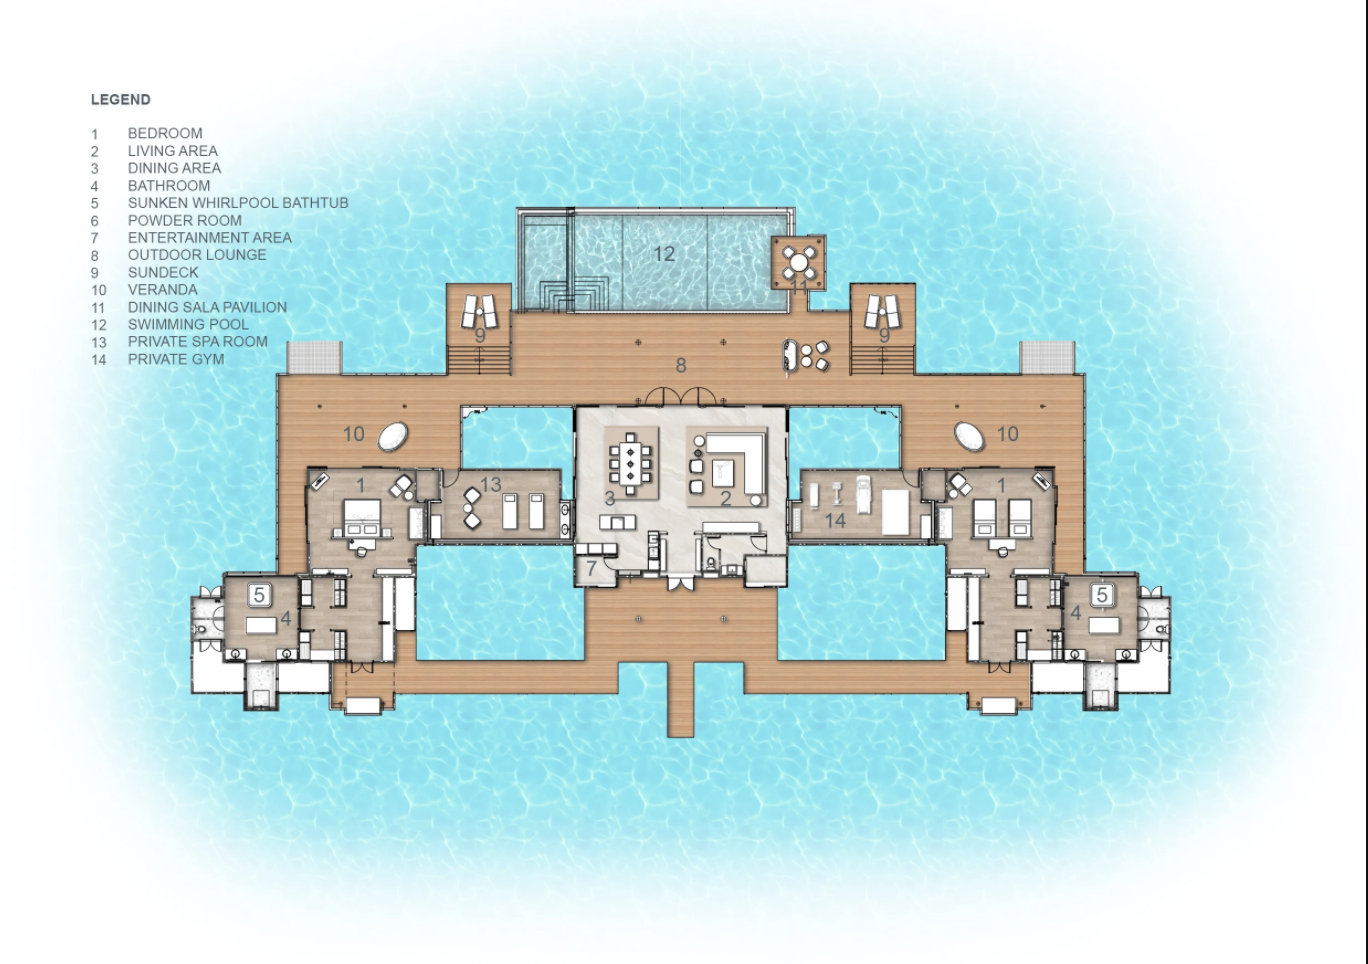 Мальдивы, отель Anantara Kihavah Maldives Villas, план-схема номера Two-Bedroom Over Water Pool Residence